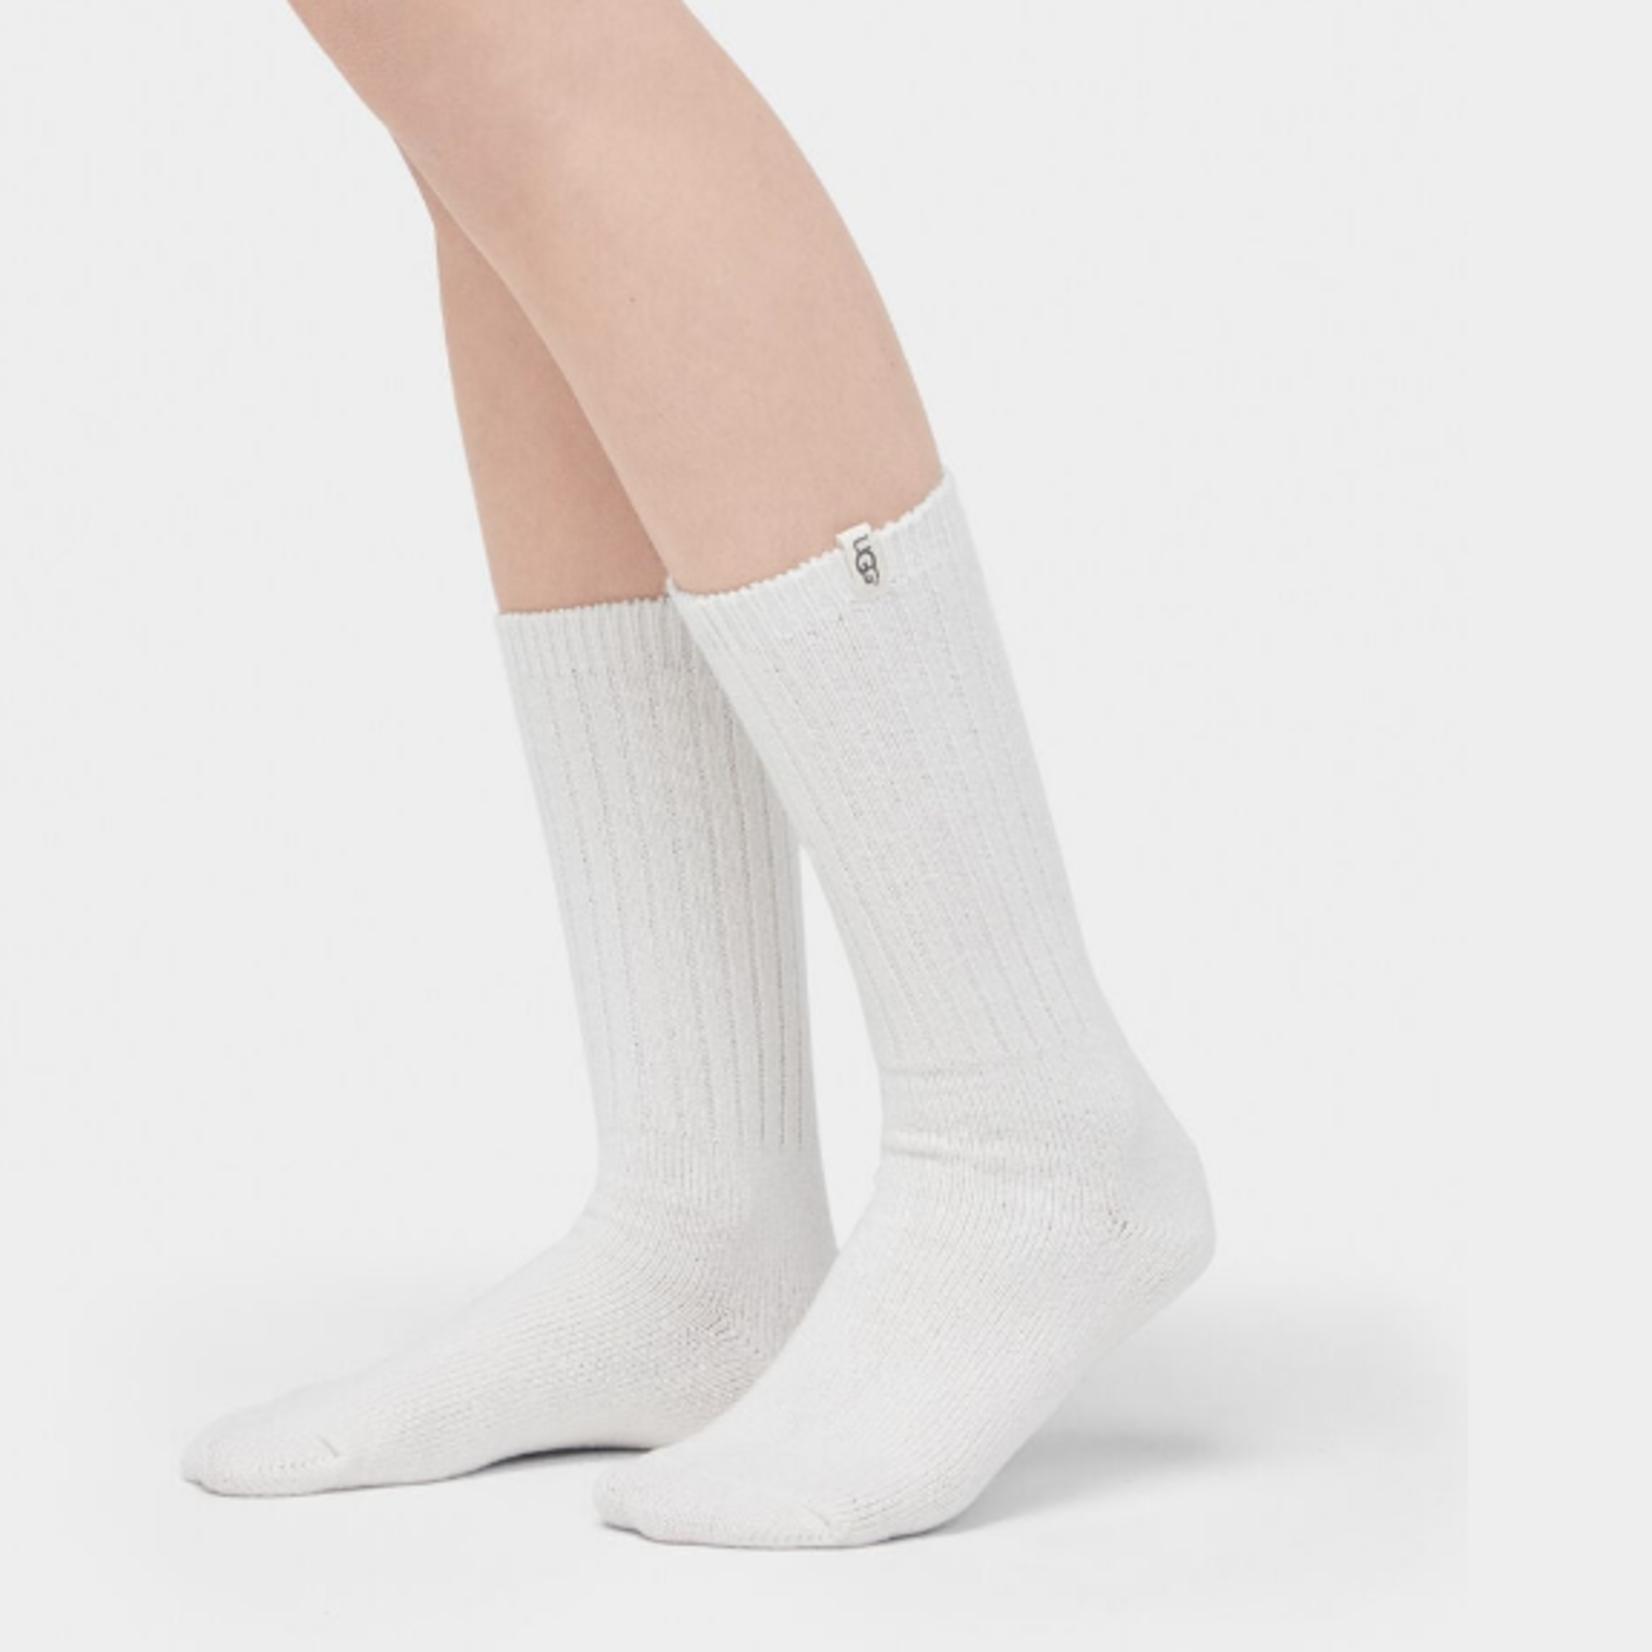 UGG® Australia UGG Rib Knit Slouchy Crew Sock - P-142904